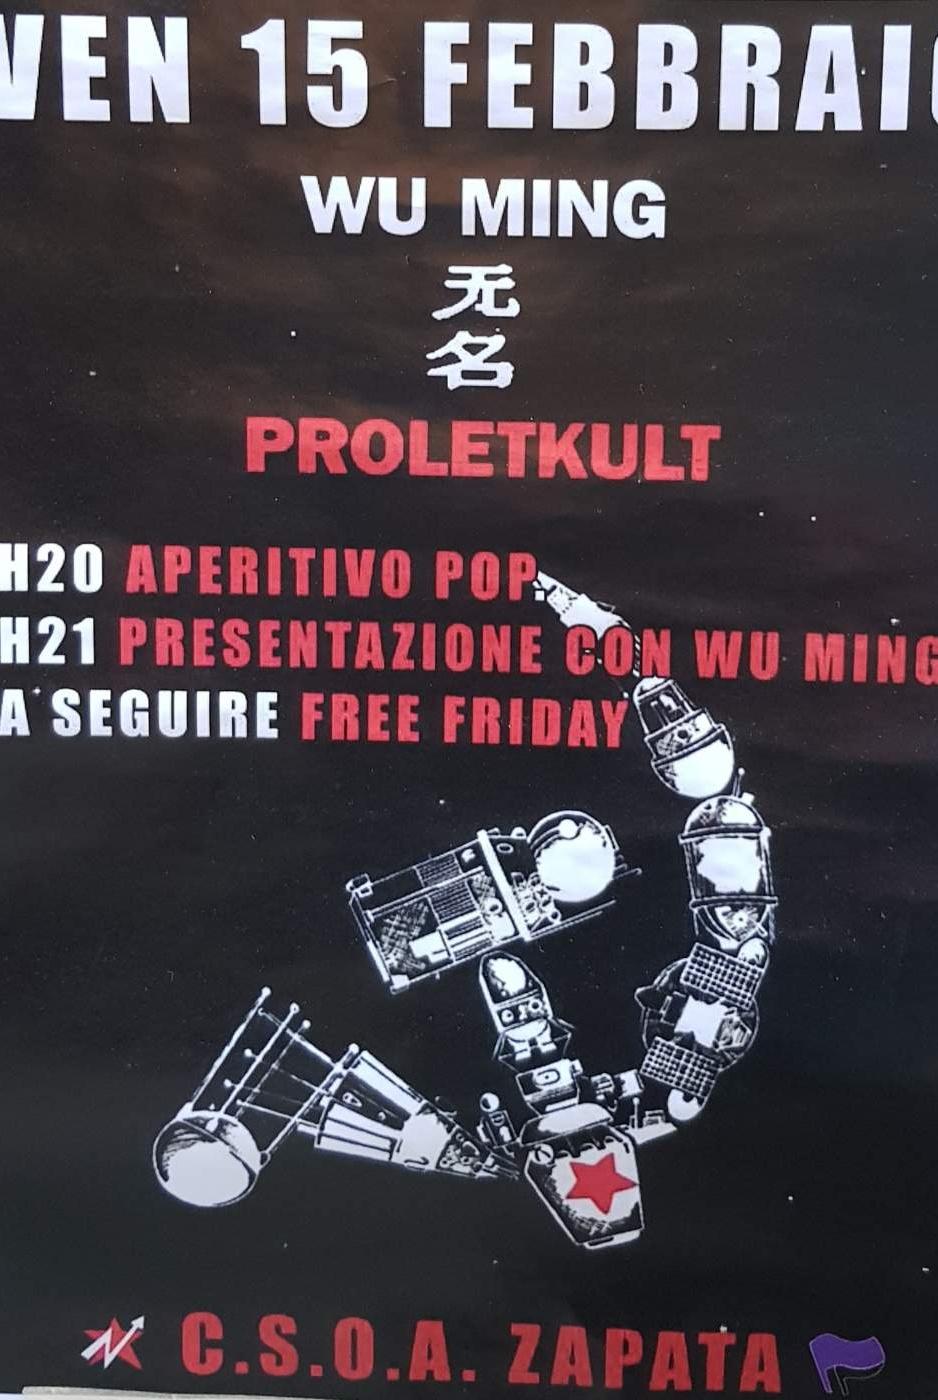 Wu Ming CSOA Zapata Via San Pier d'Arena 36, 16151 Genova Dal 15/02/2019 Al 15/02/2019 20:00 - 02:00